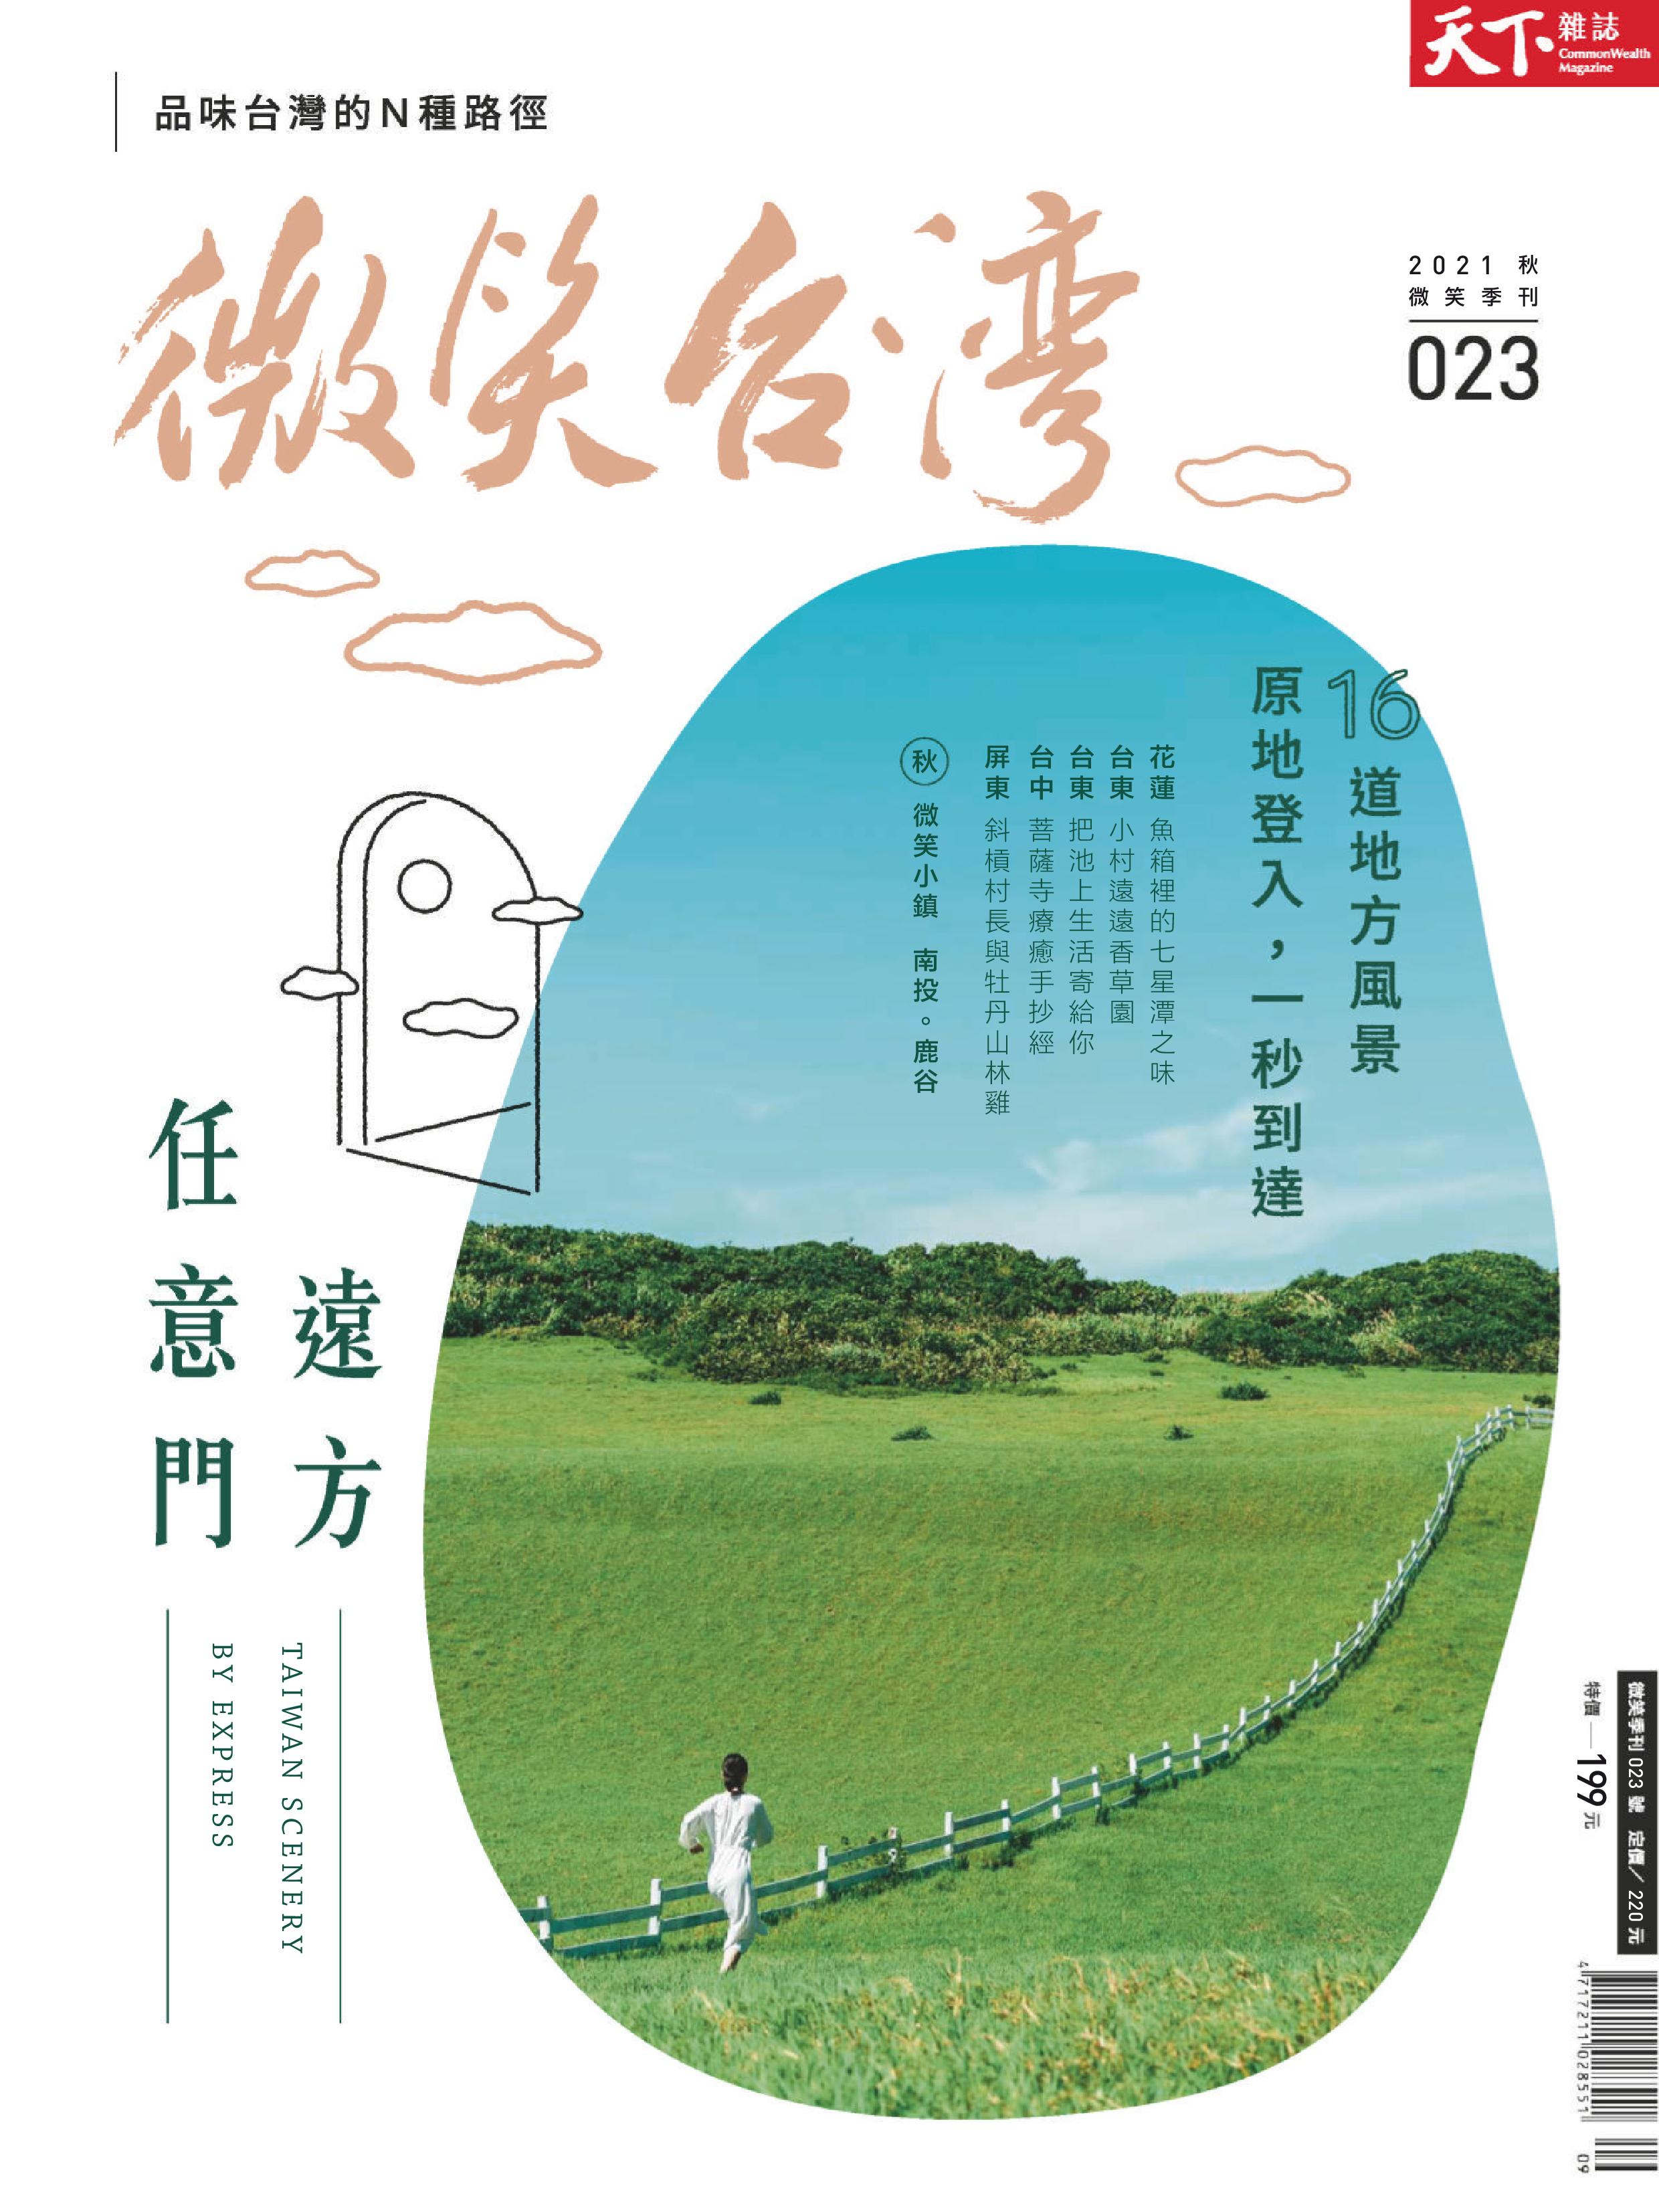 Smile Quarterly 微笑季刊 - 九月 2021